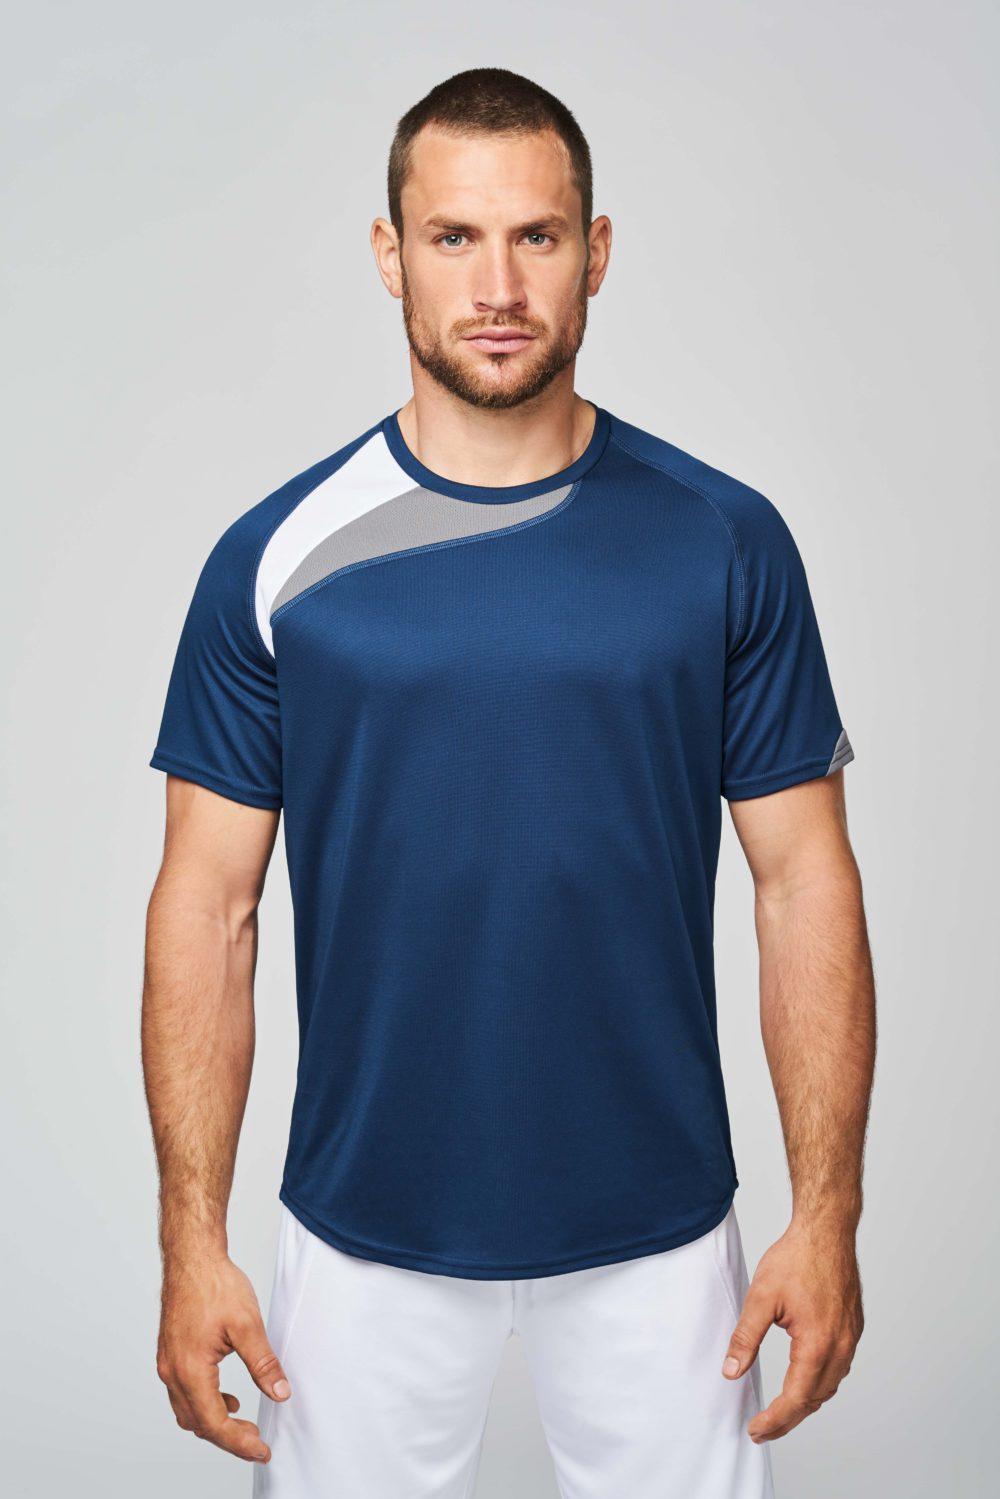 PA436 Sportshirt Teamwear Proact